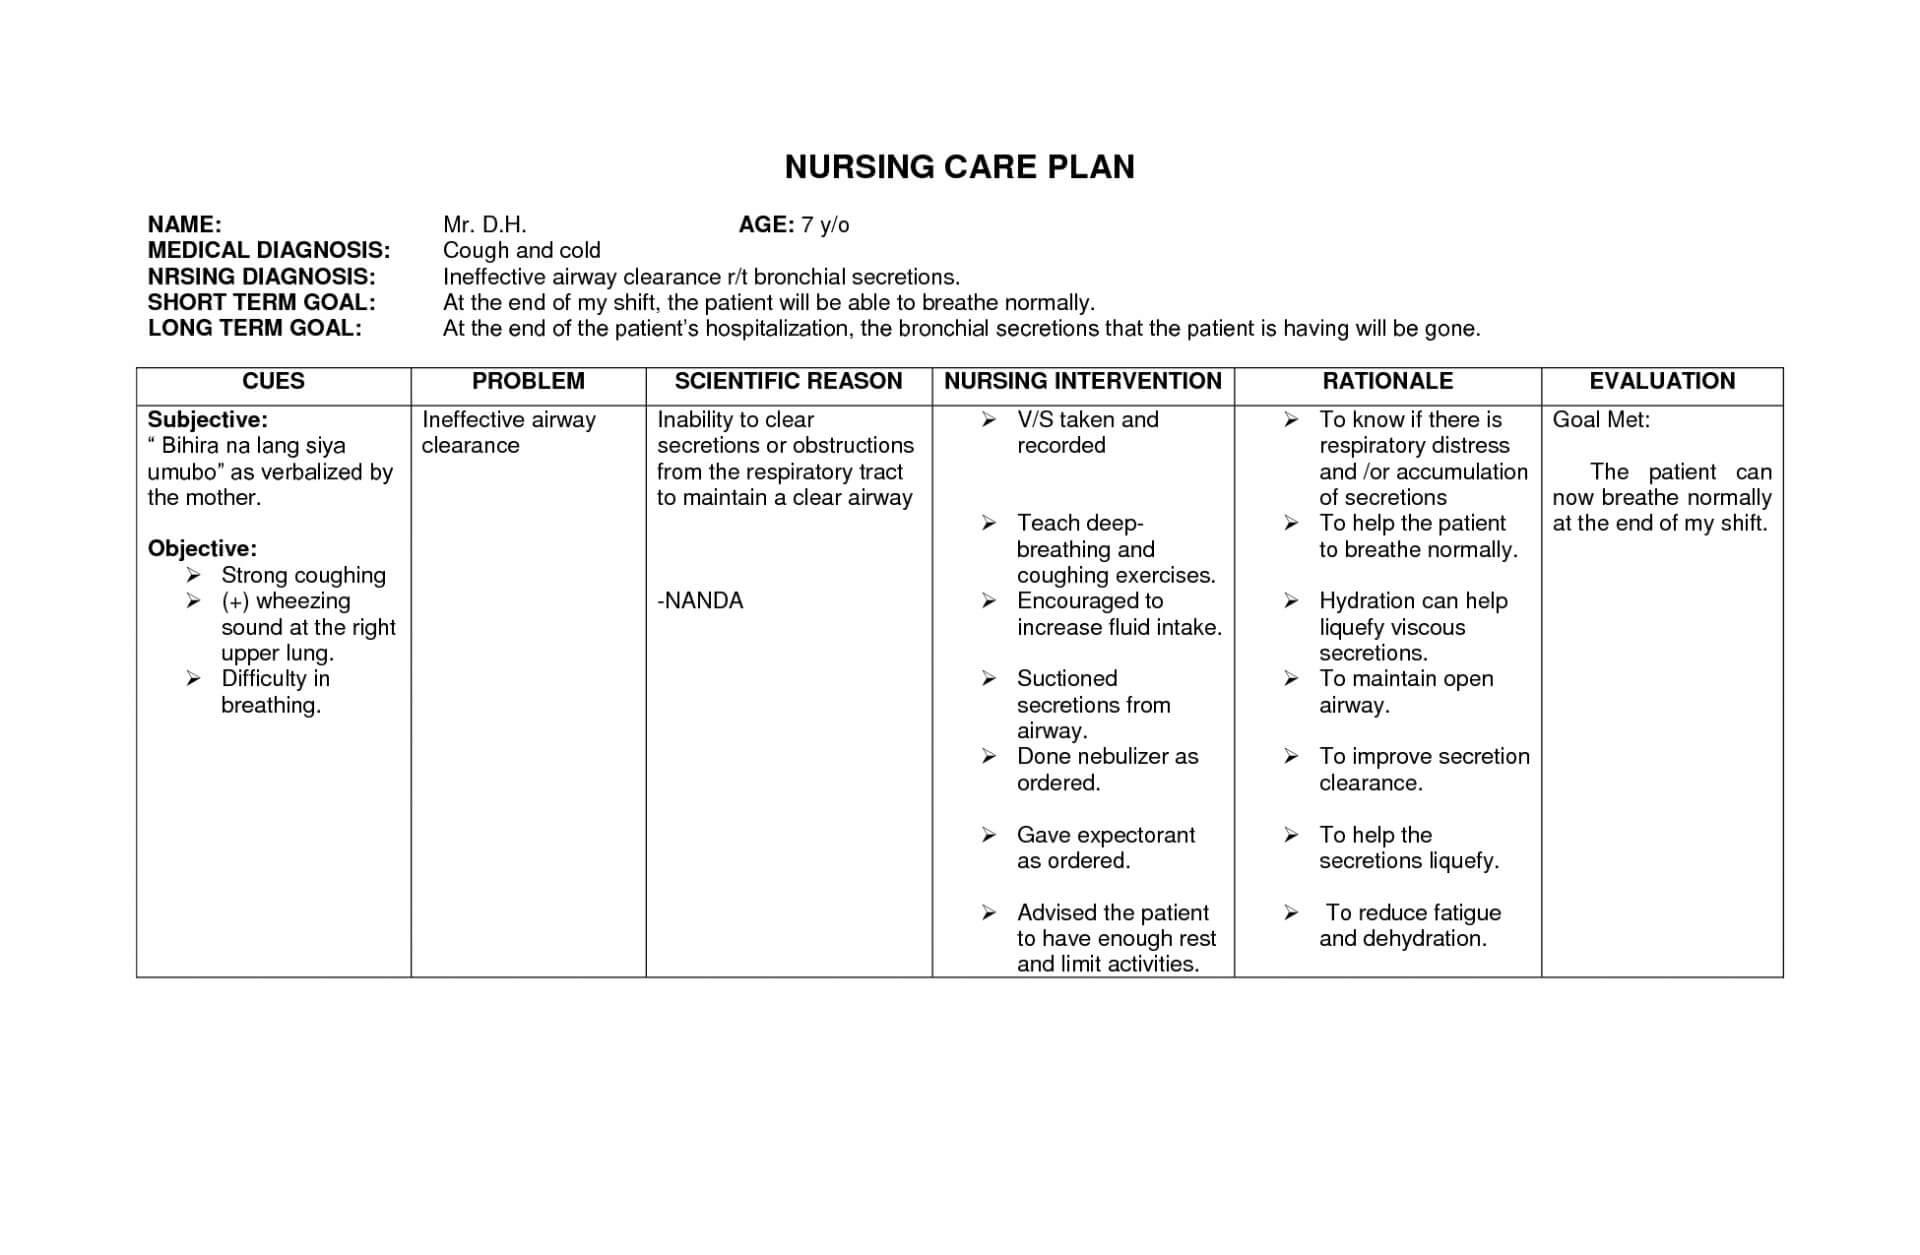 003 Nursing Care Plan Template Unbelievable Ideas Word In Nursing Care Plan Template Word